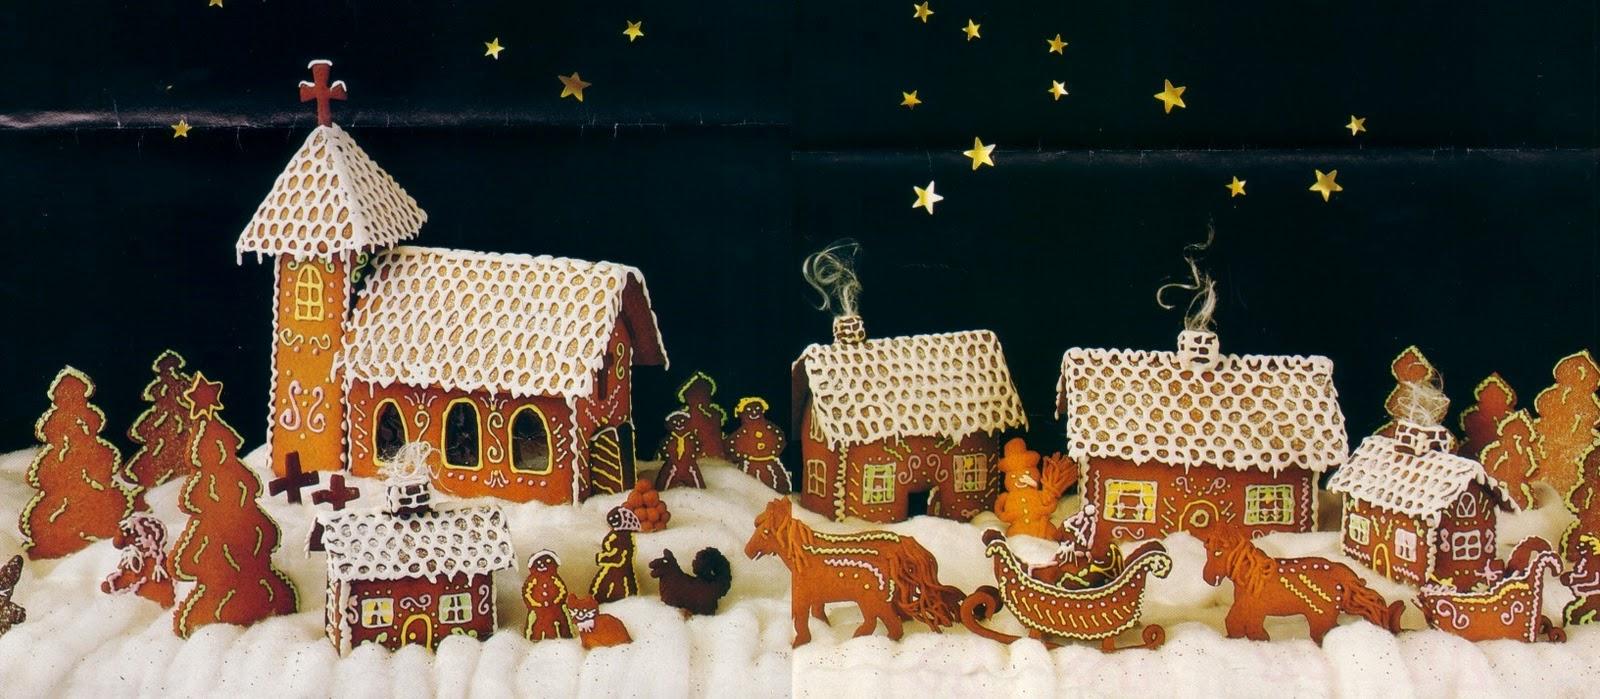 Kanelstrand Scandinavian Christmas The Gingerbread House